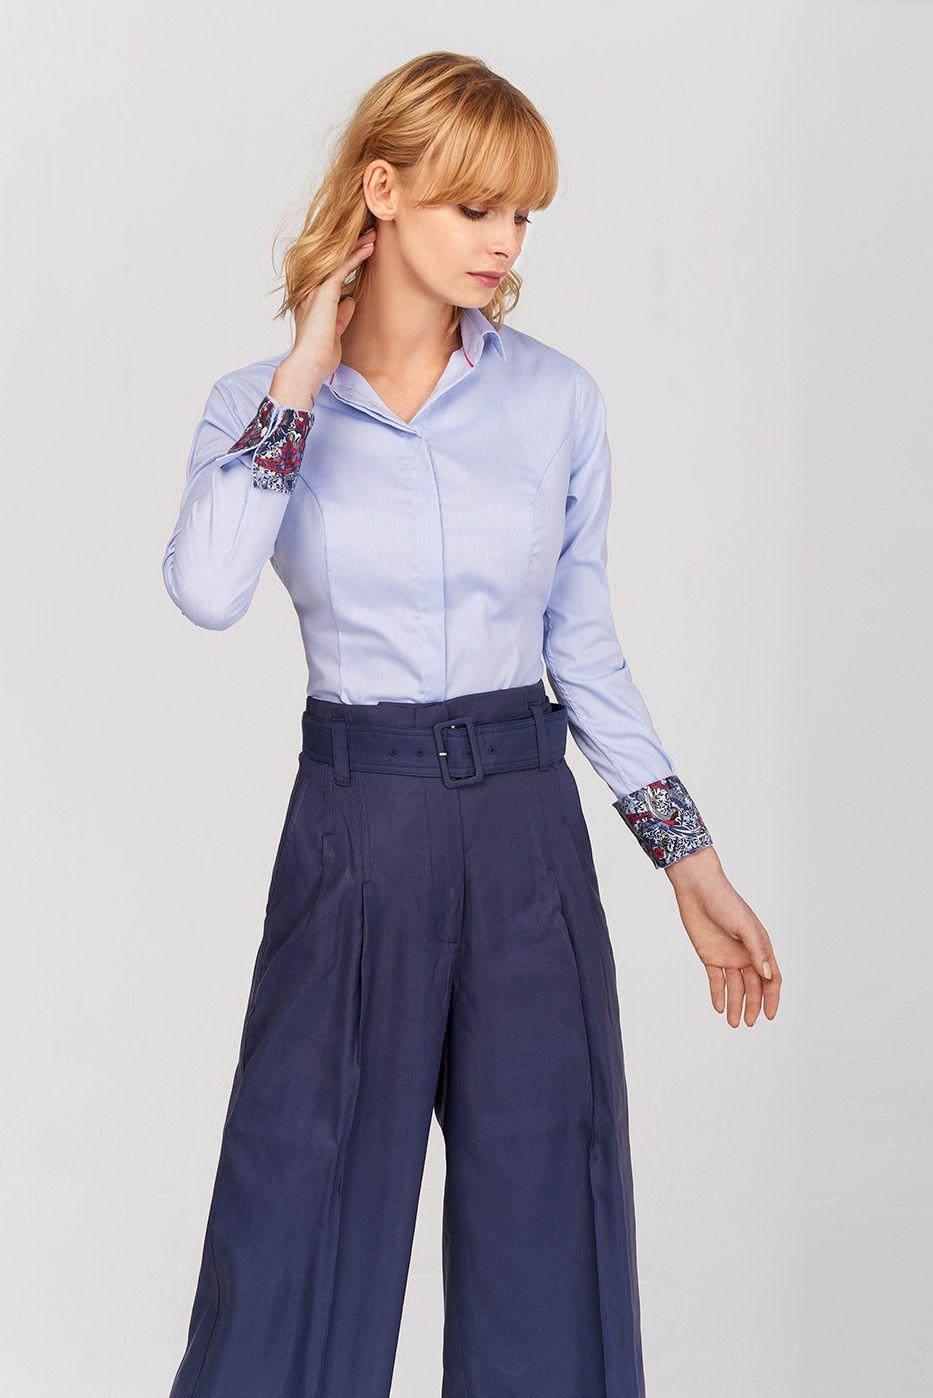 Błękitna koszula damska